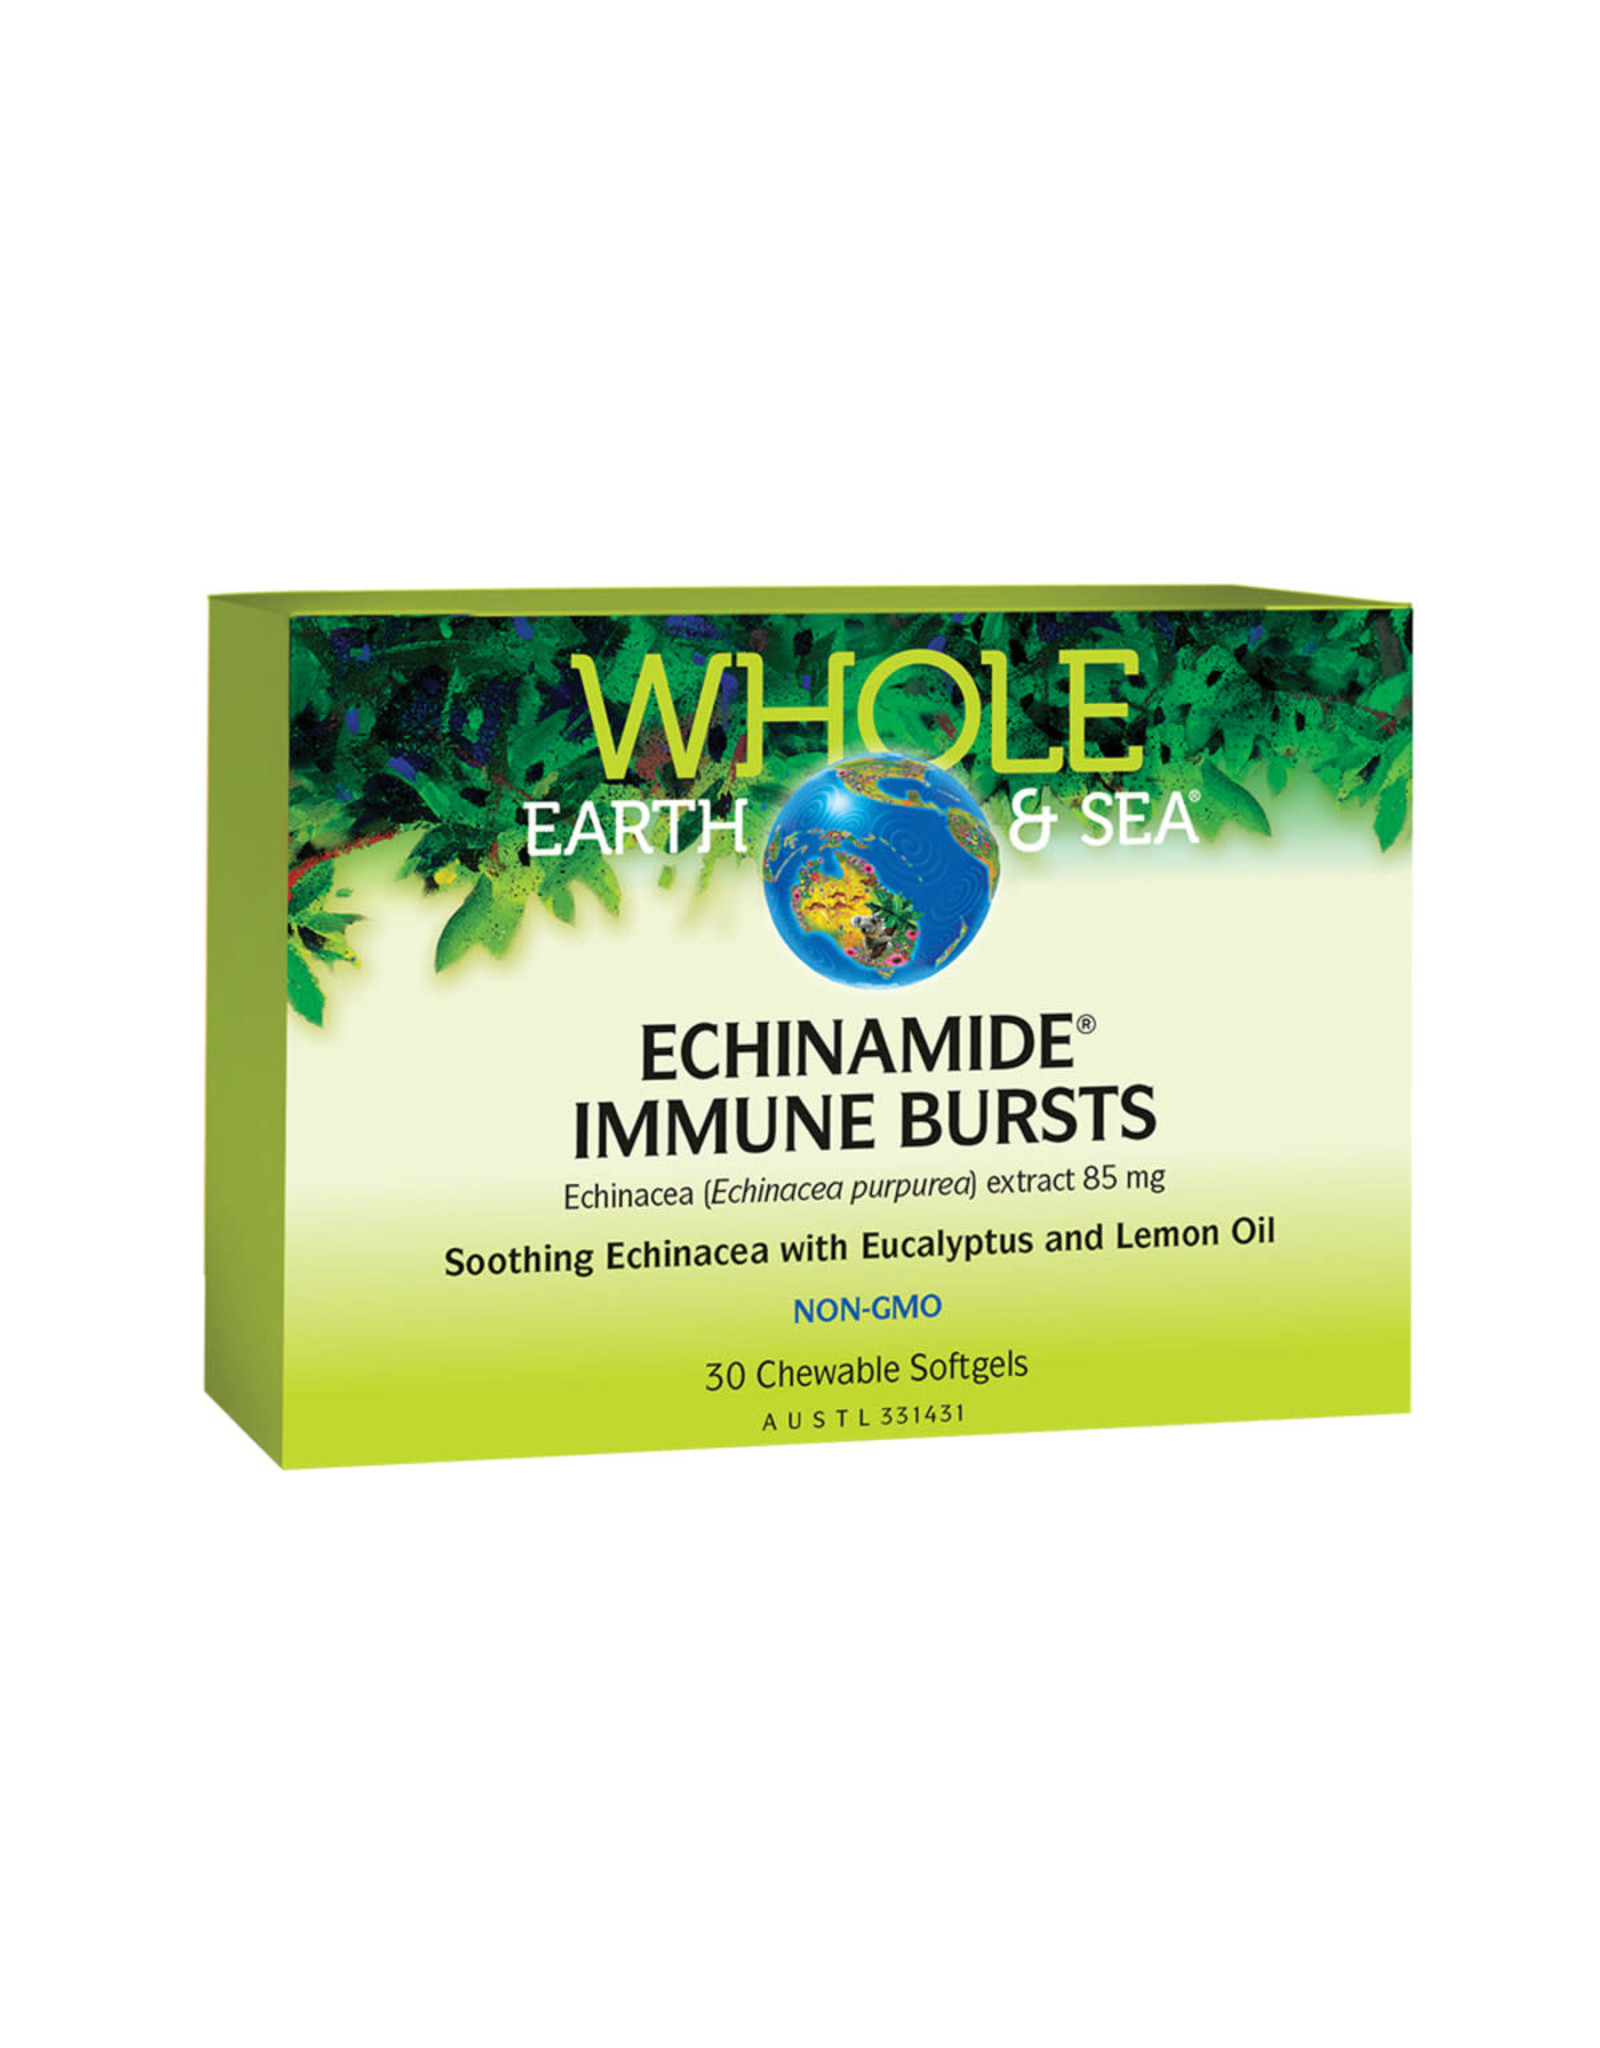 Whole Earth & Sea Echinamide Immune Burst 30c